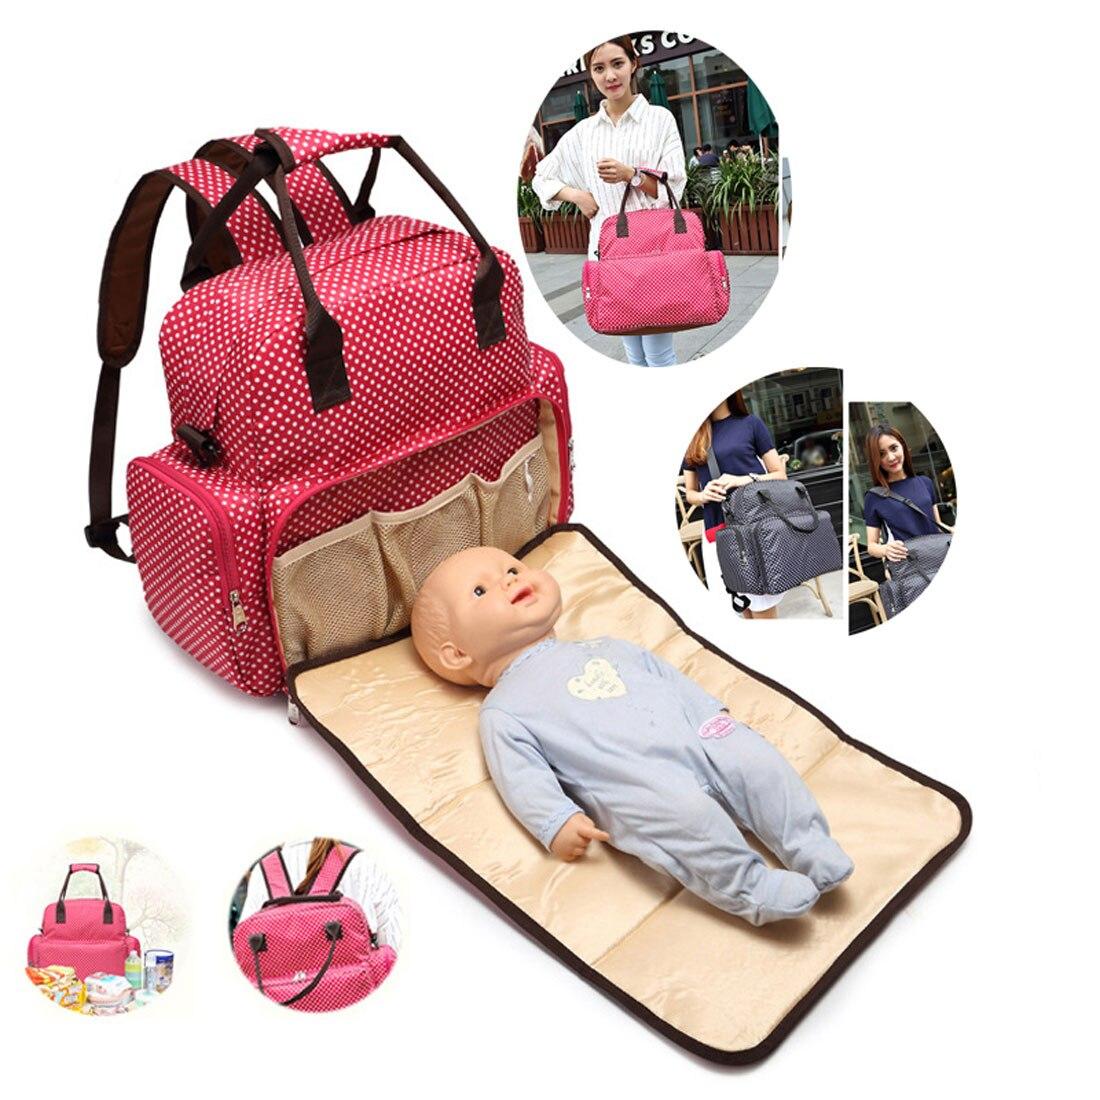 New Brand Baby Diaper Bag Multifunctional Baby Bed Waterproof Shoulder Bags Messenger Bag Diaper Bag Backpack Large Capacity